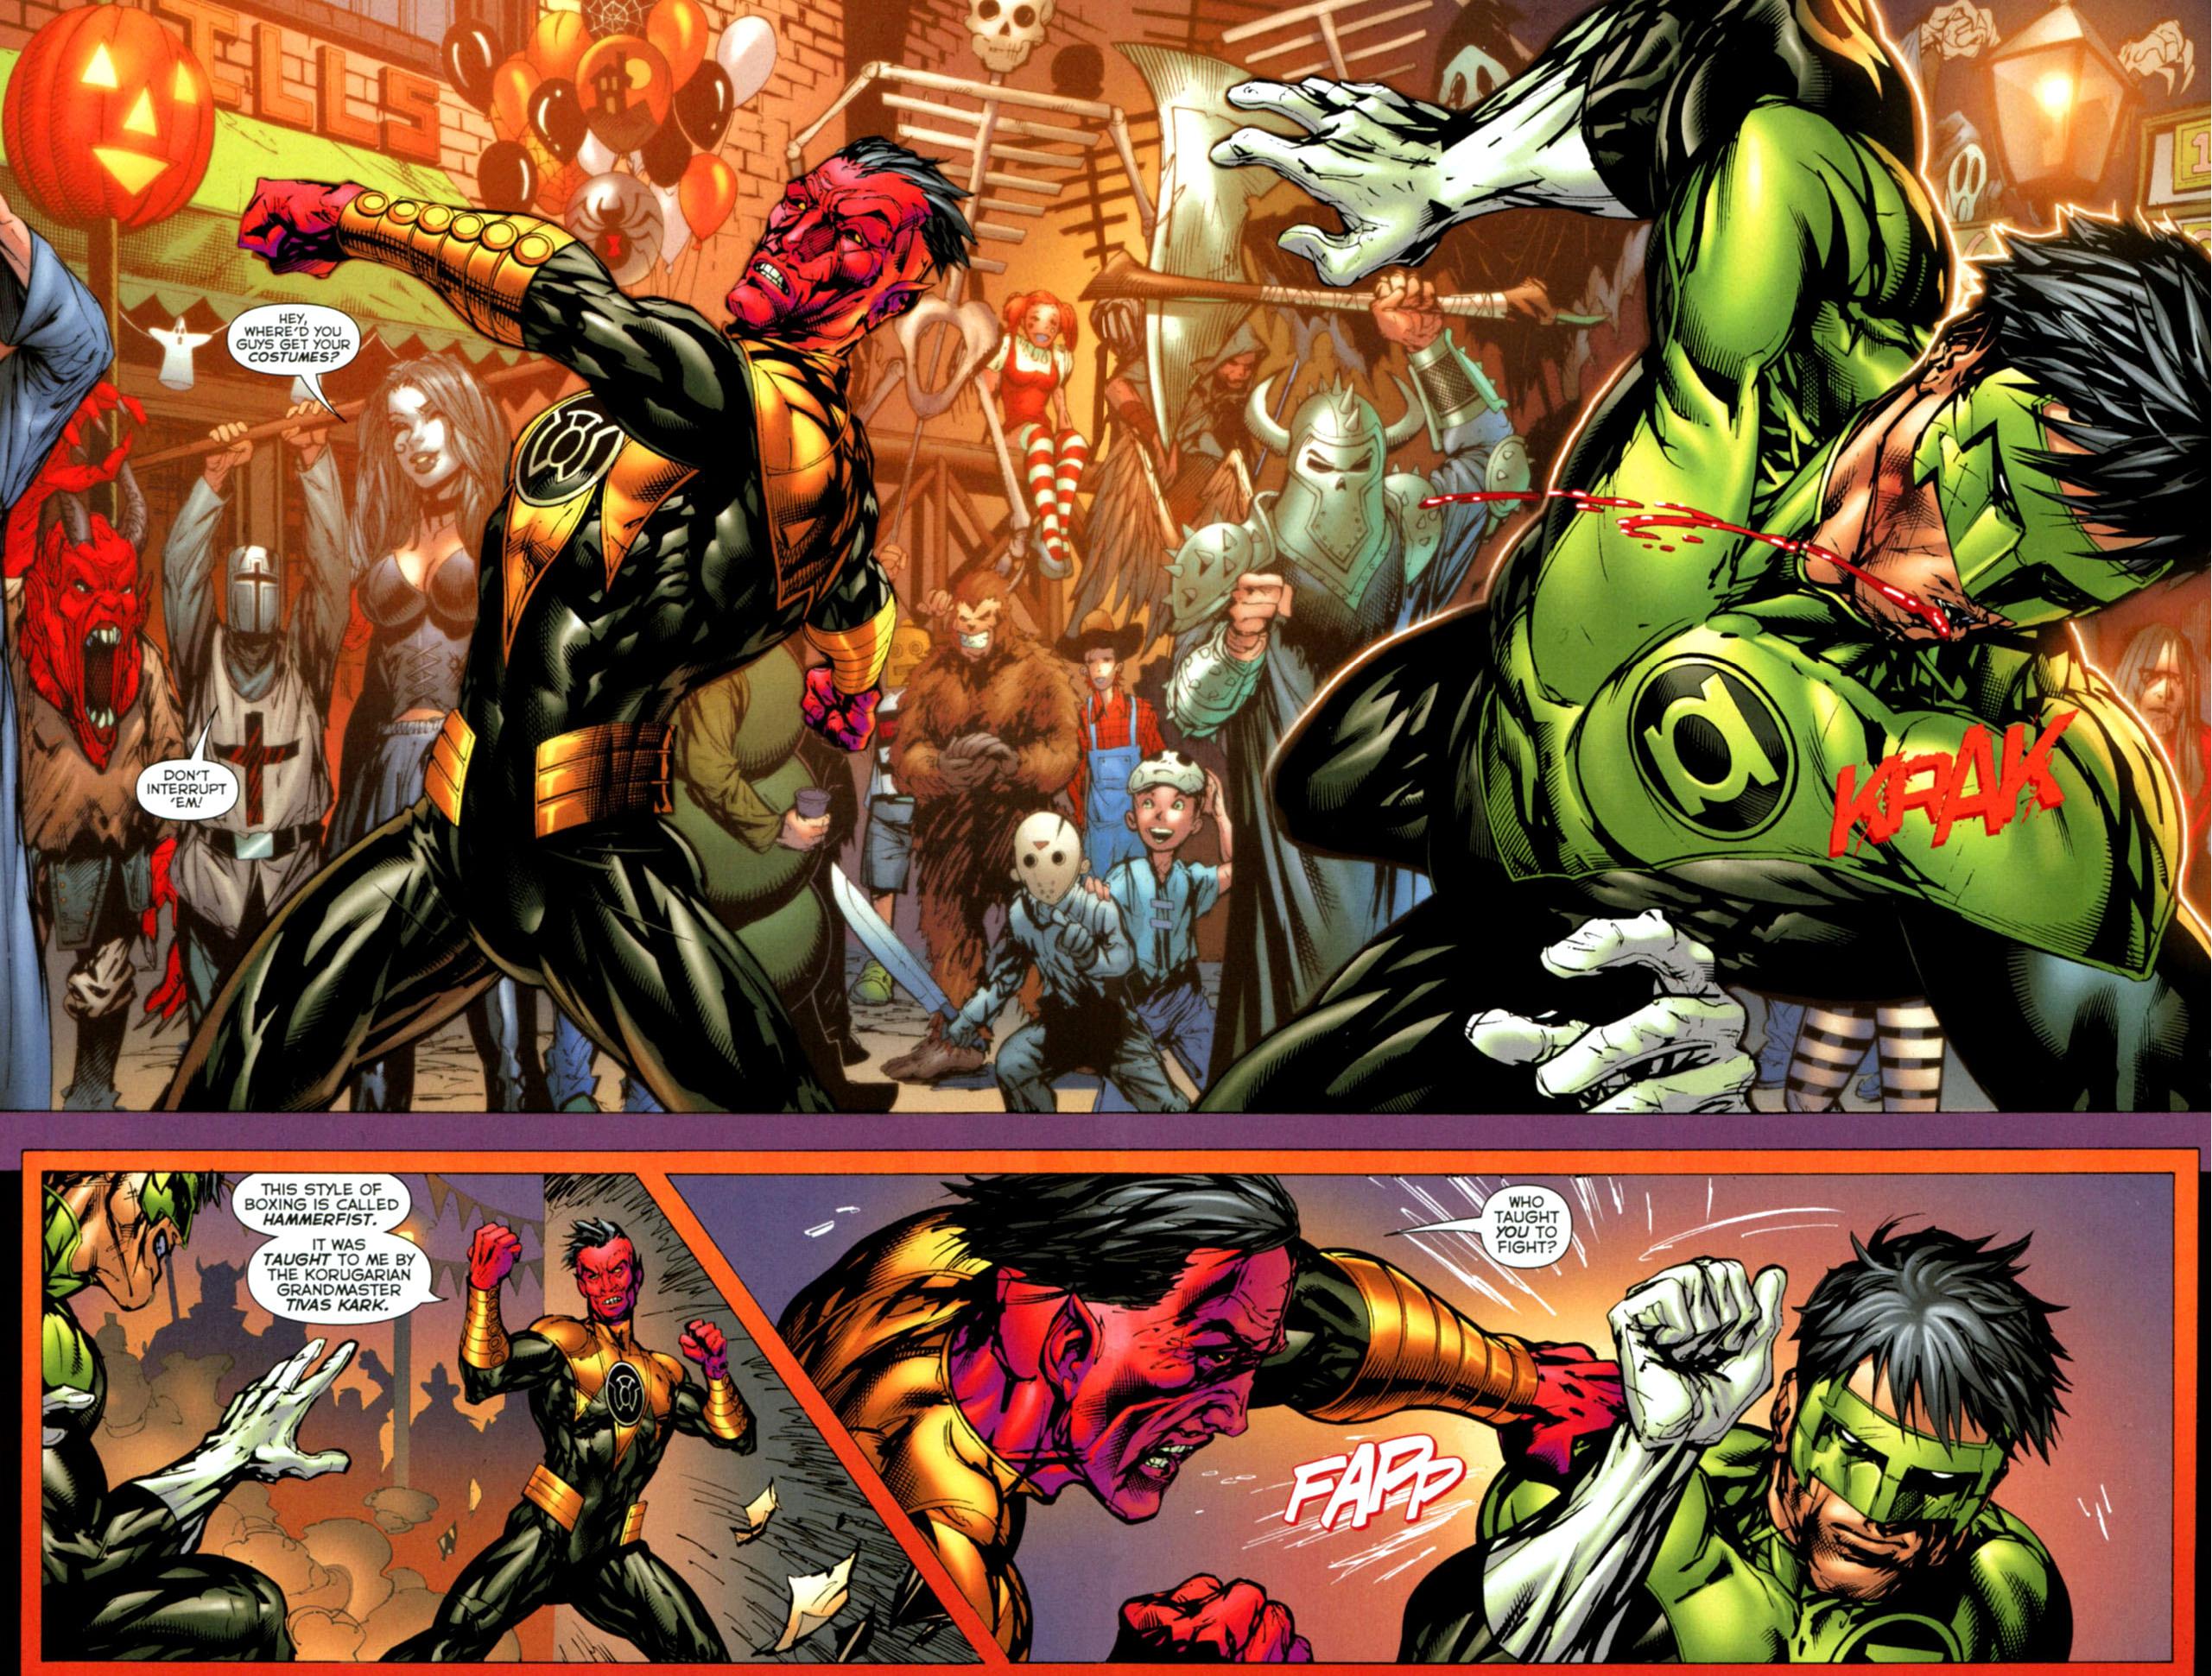 green lantern vs sinestro fist fight